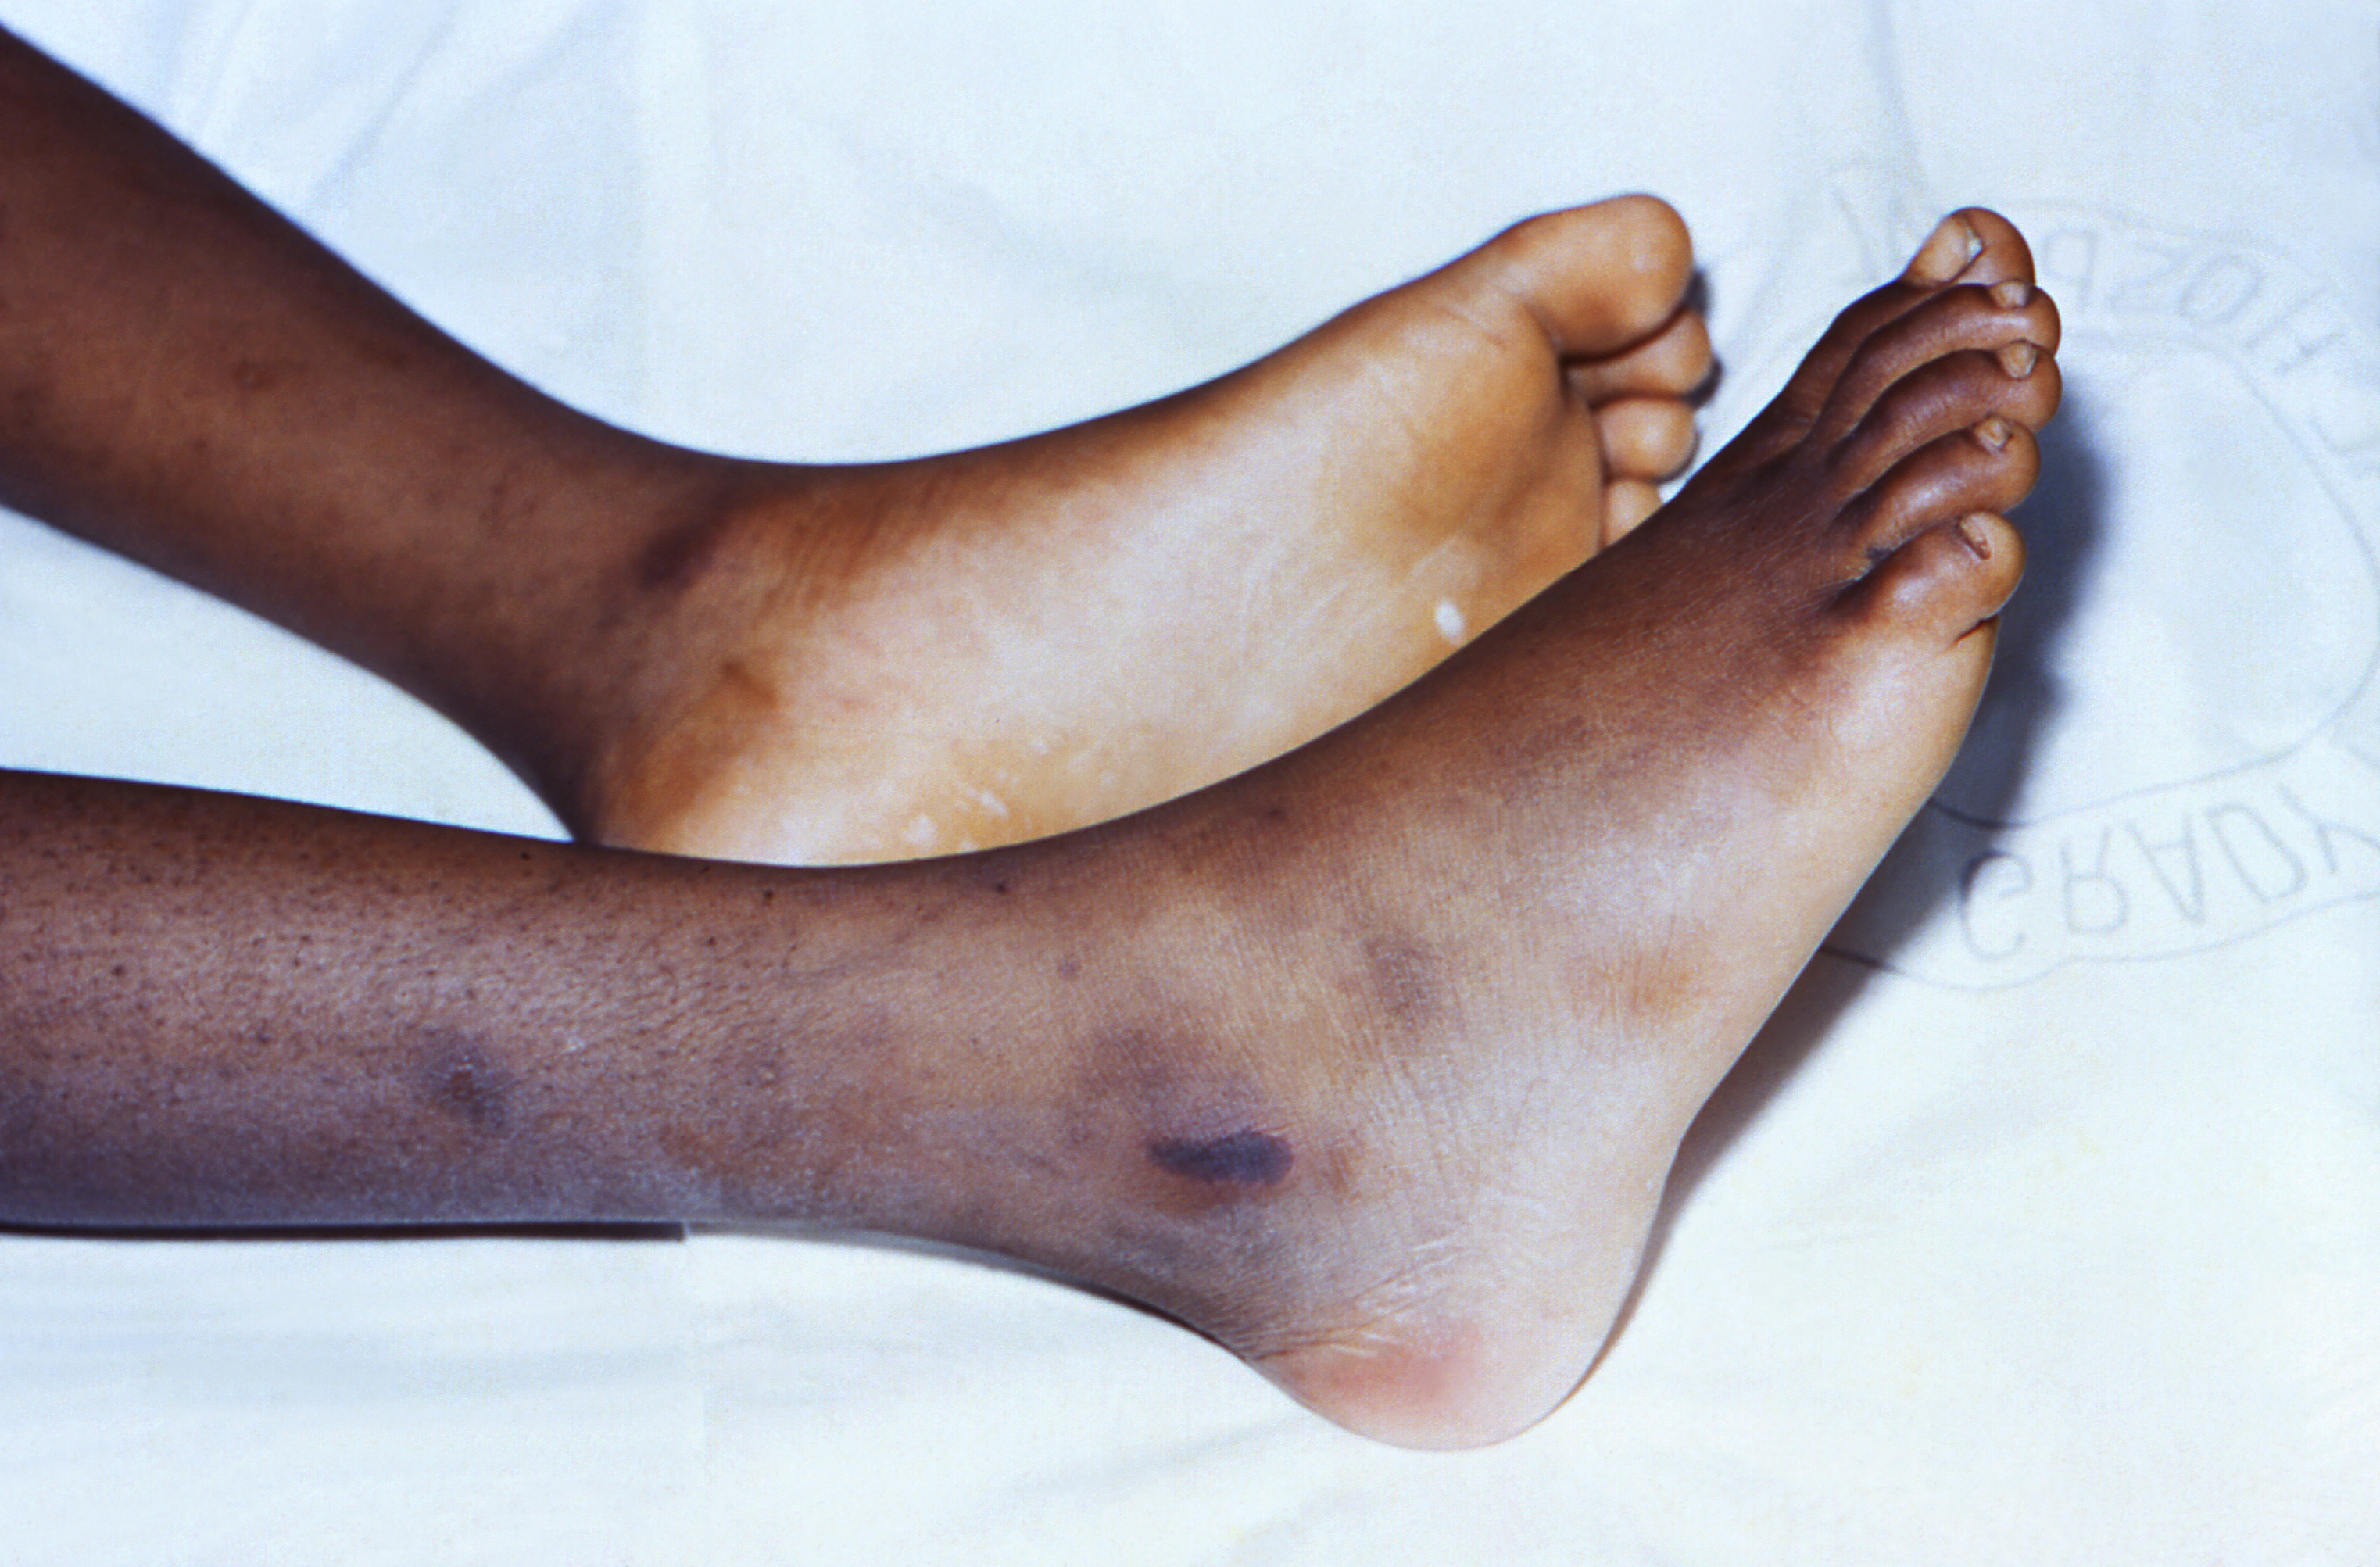 tickborne-illness-women-rocky-mt-spotted-fever